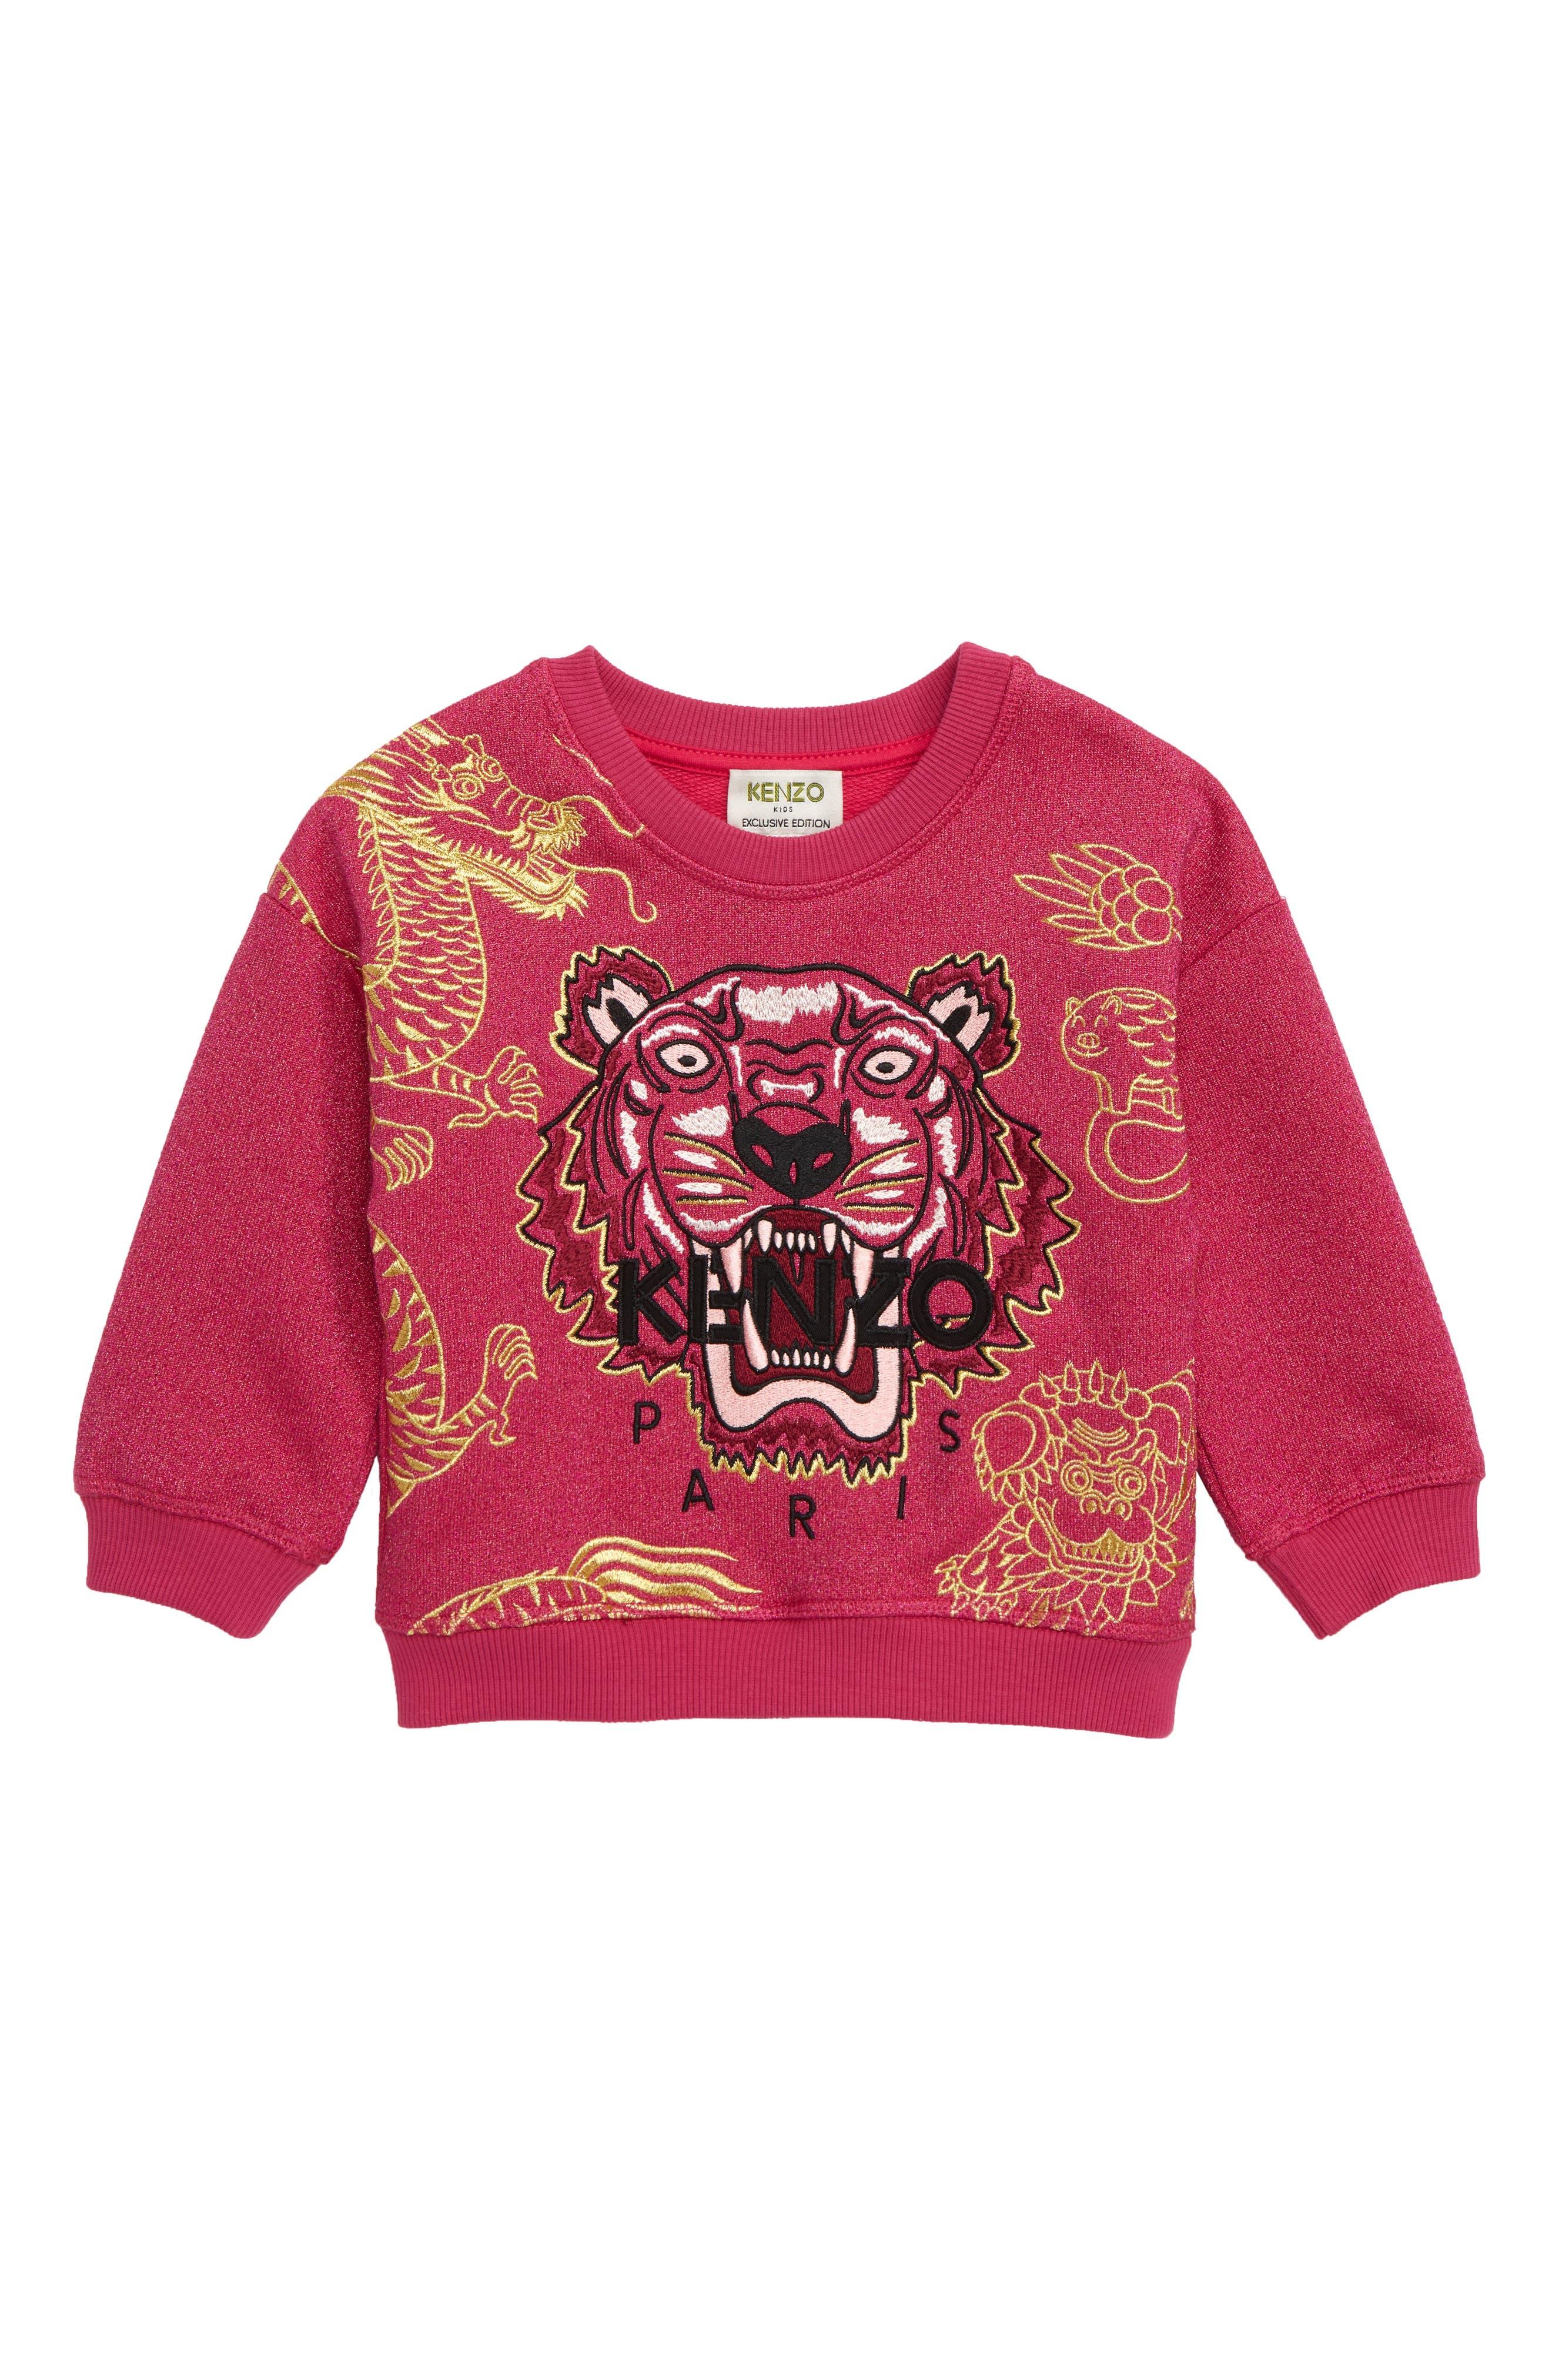 Year of the Pig Glitter Sweatshirt,                             Main thumbnail 1, color,                             FUSCHIA